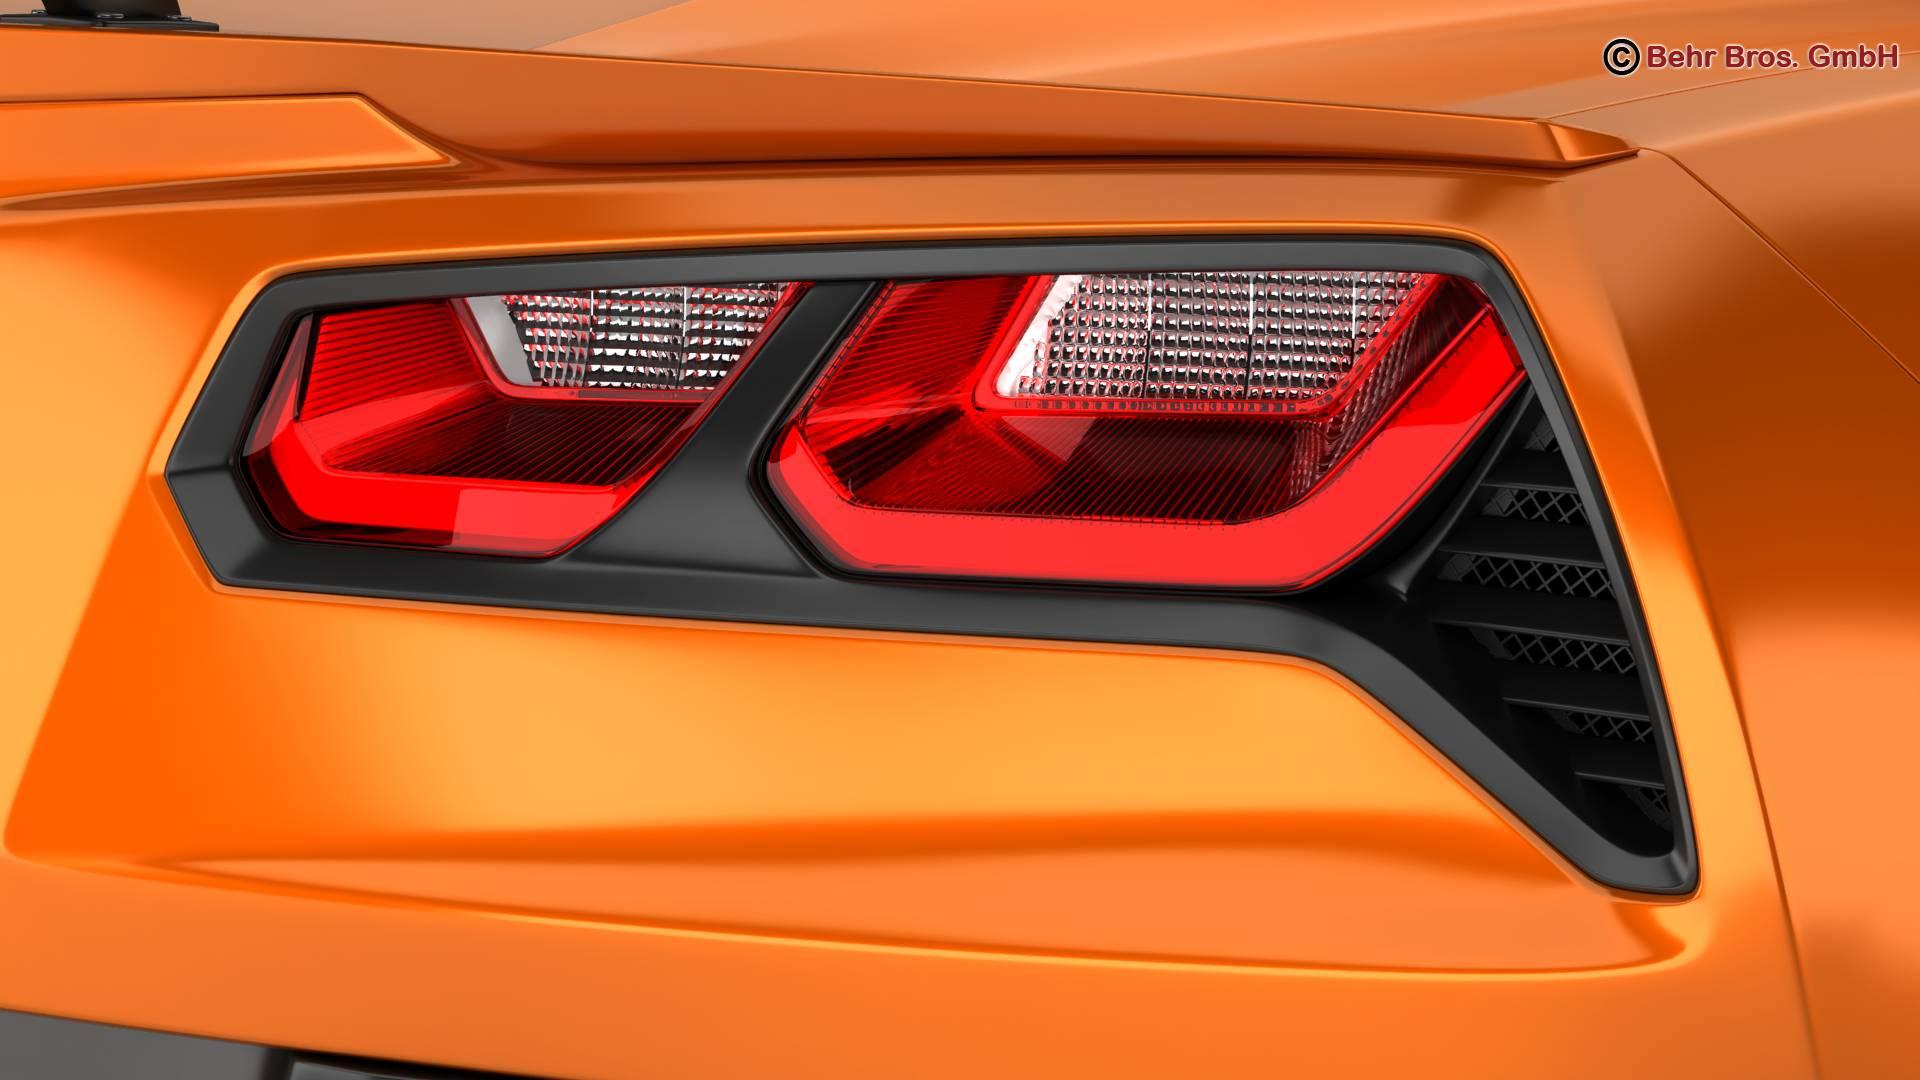 chevrolet corvette zr1 2019 3d model 3ds max fbx c4d lwo ma mb obj 275976